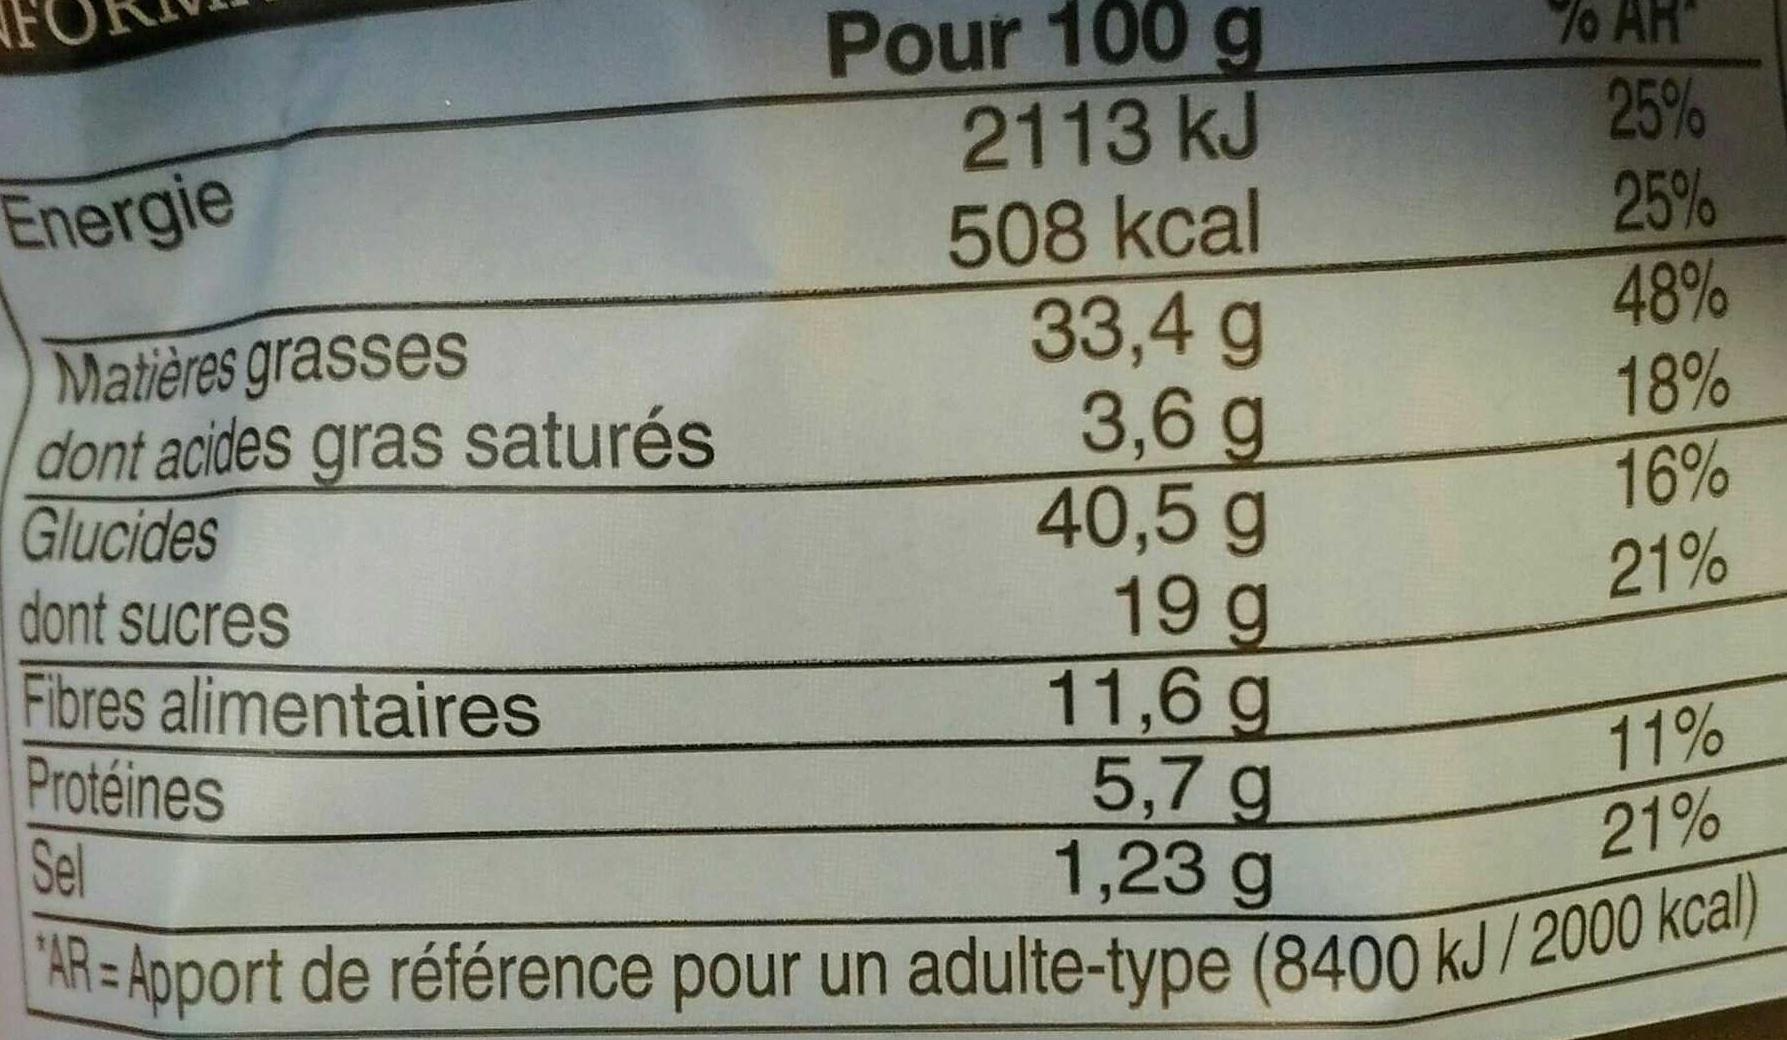 A l heure de chips de légumes - Voedingswaarden - fr